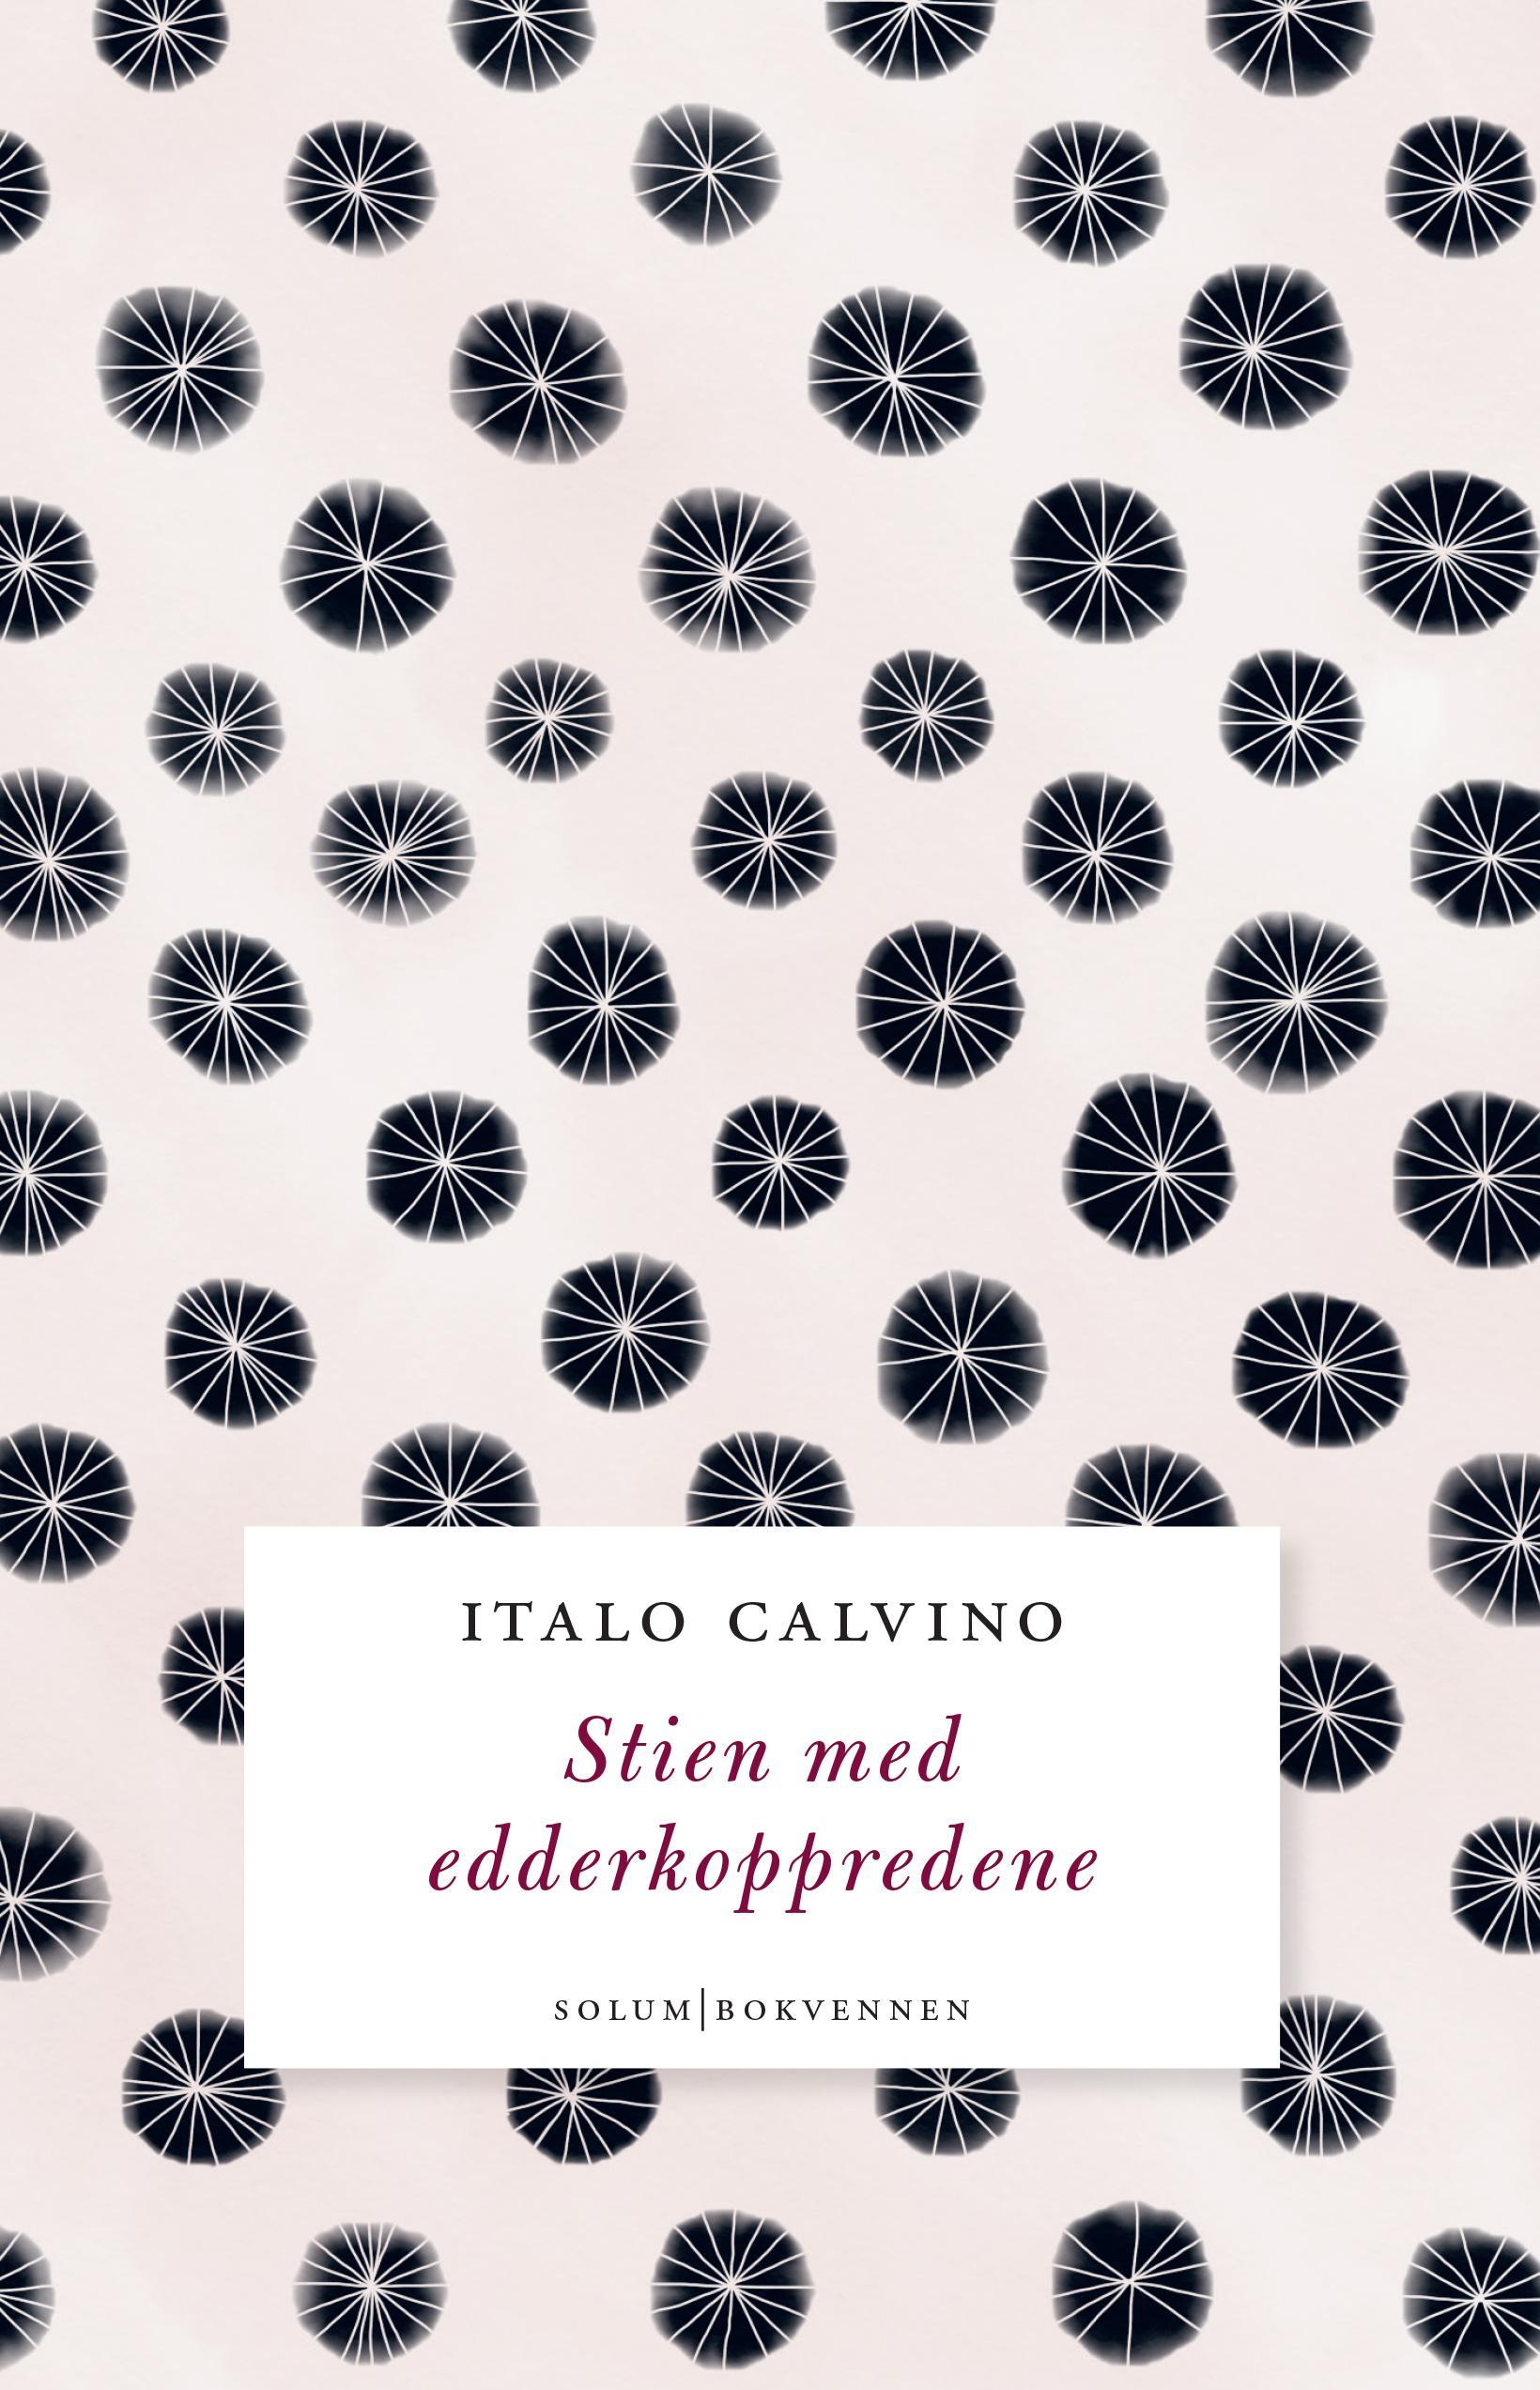 """Stien med edderkoppredene - roman"" av Italo Calvino"